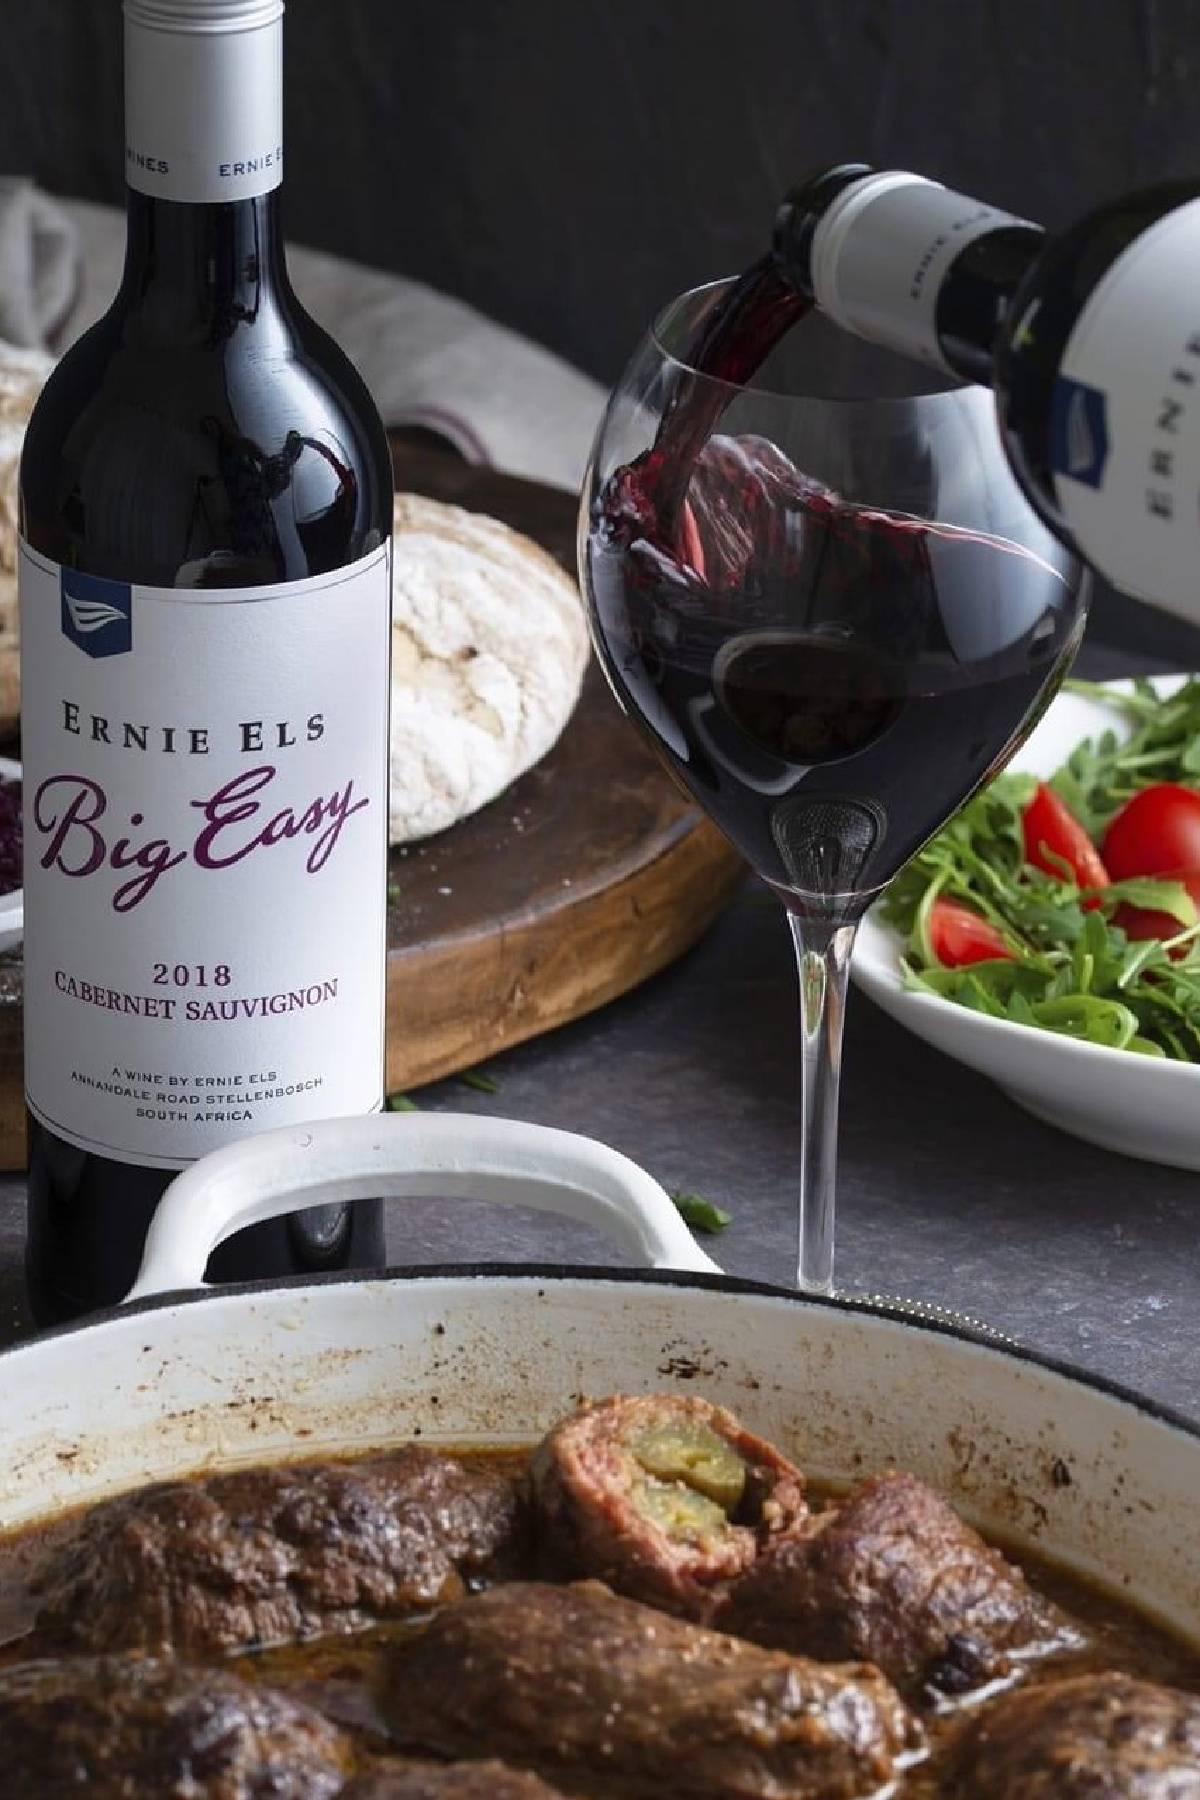 Ernie Els Big Easy Cabernet Sauvignon - hartige rollade gerecht